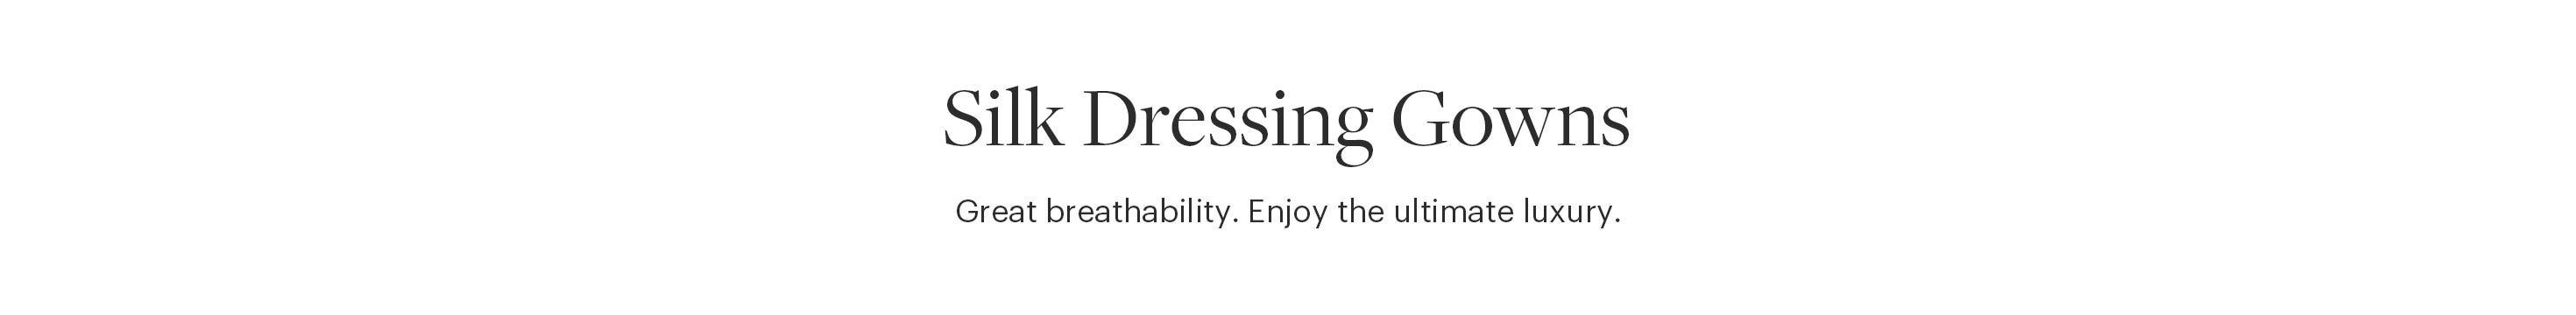 Silk Dressing Gowns for Women